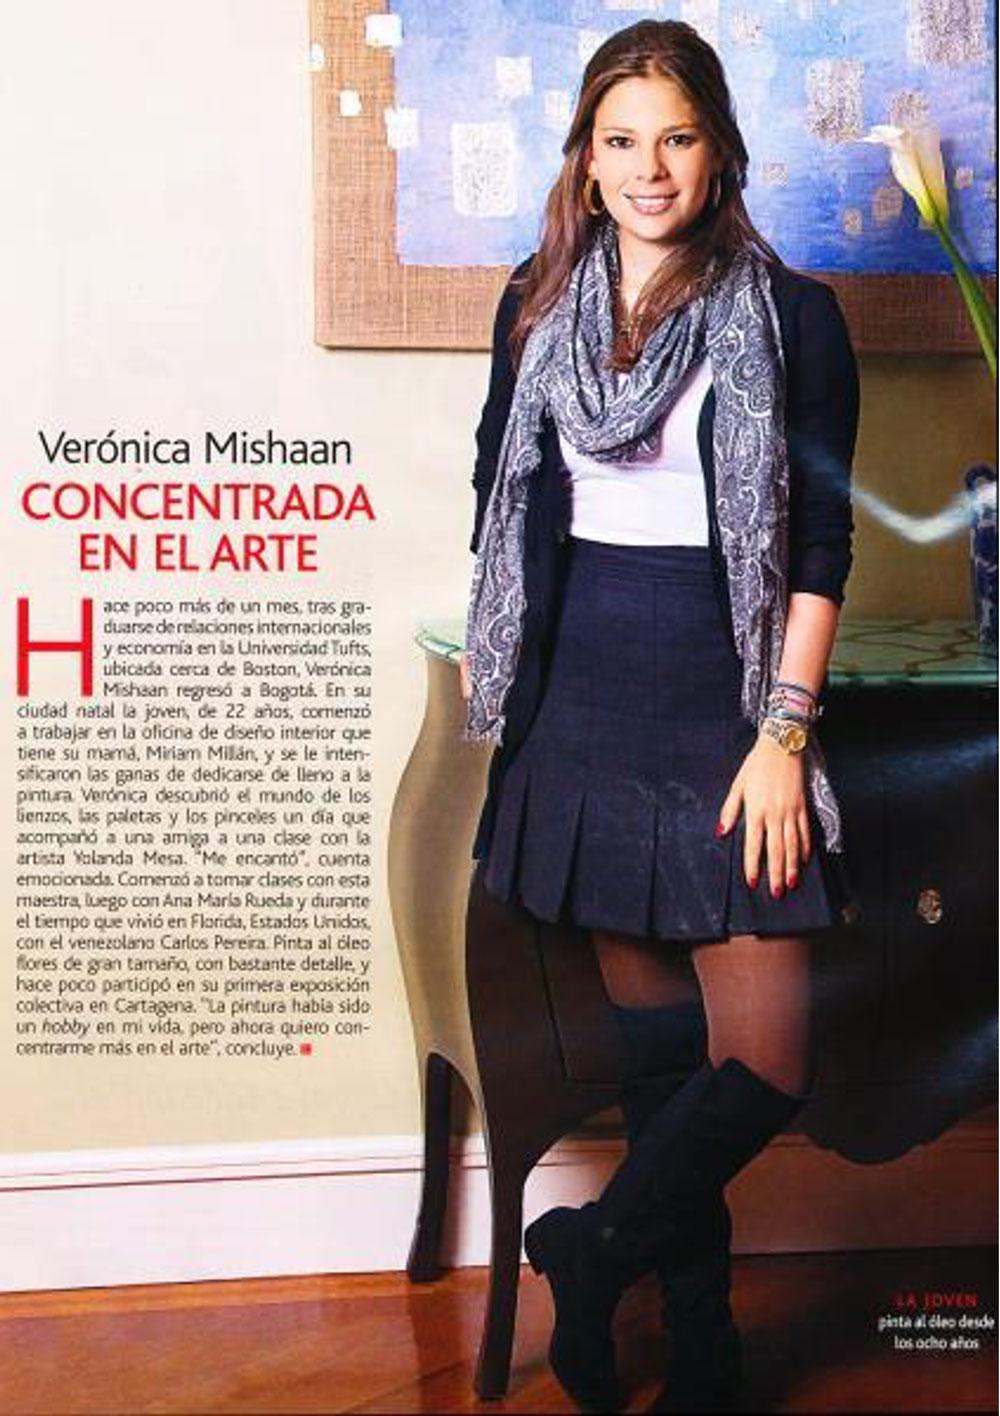 Caras, Veronica Mishaan